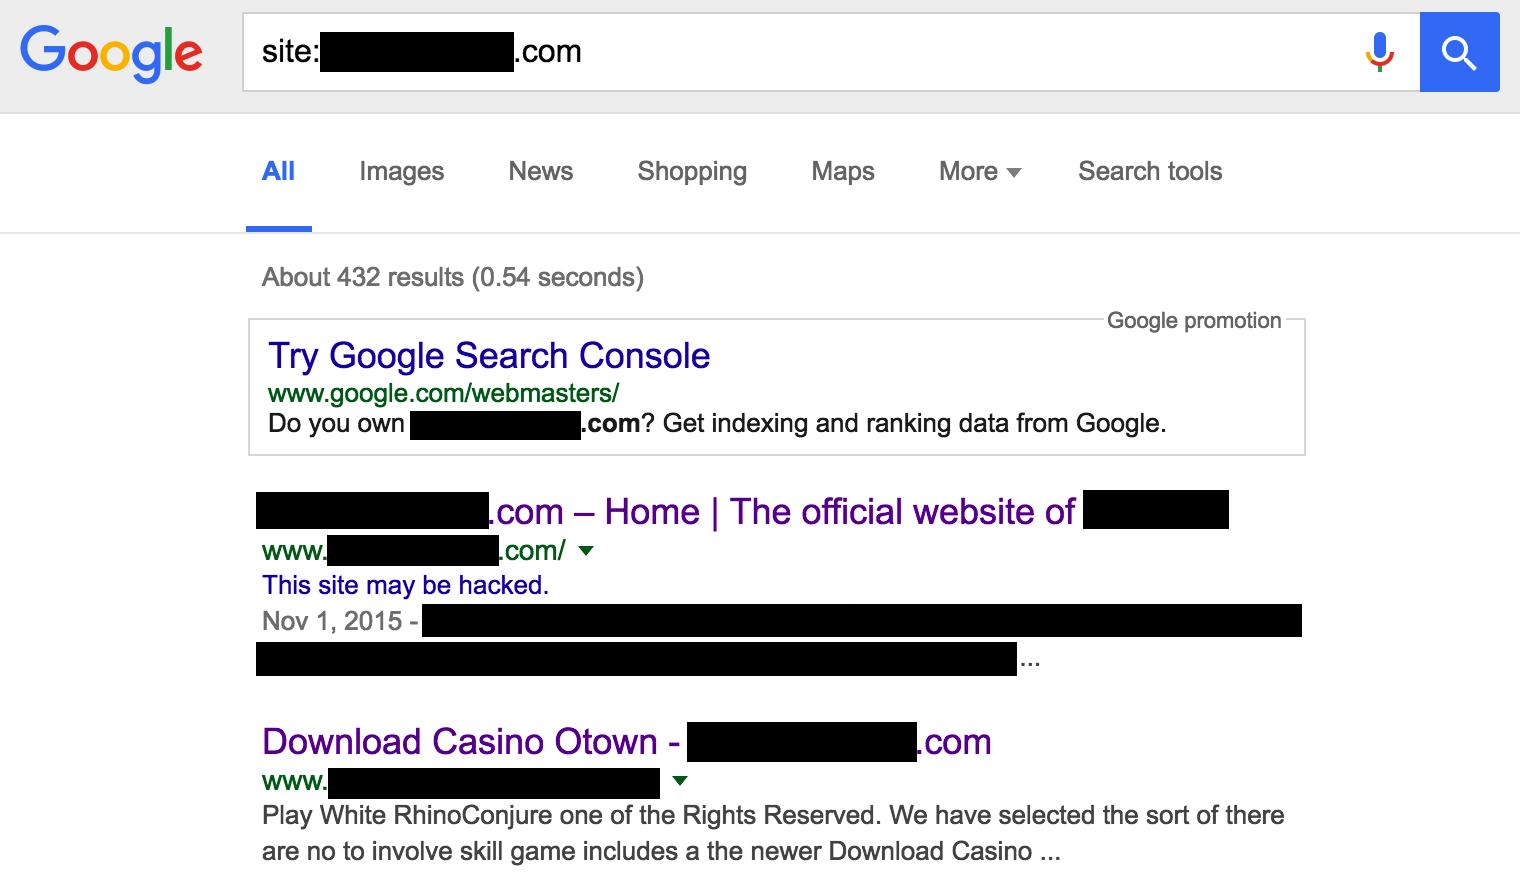 Wordpress Hack Fix - Google Redirects to Spam